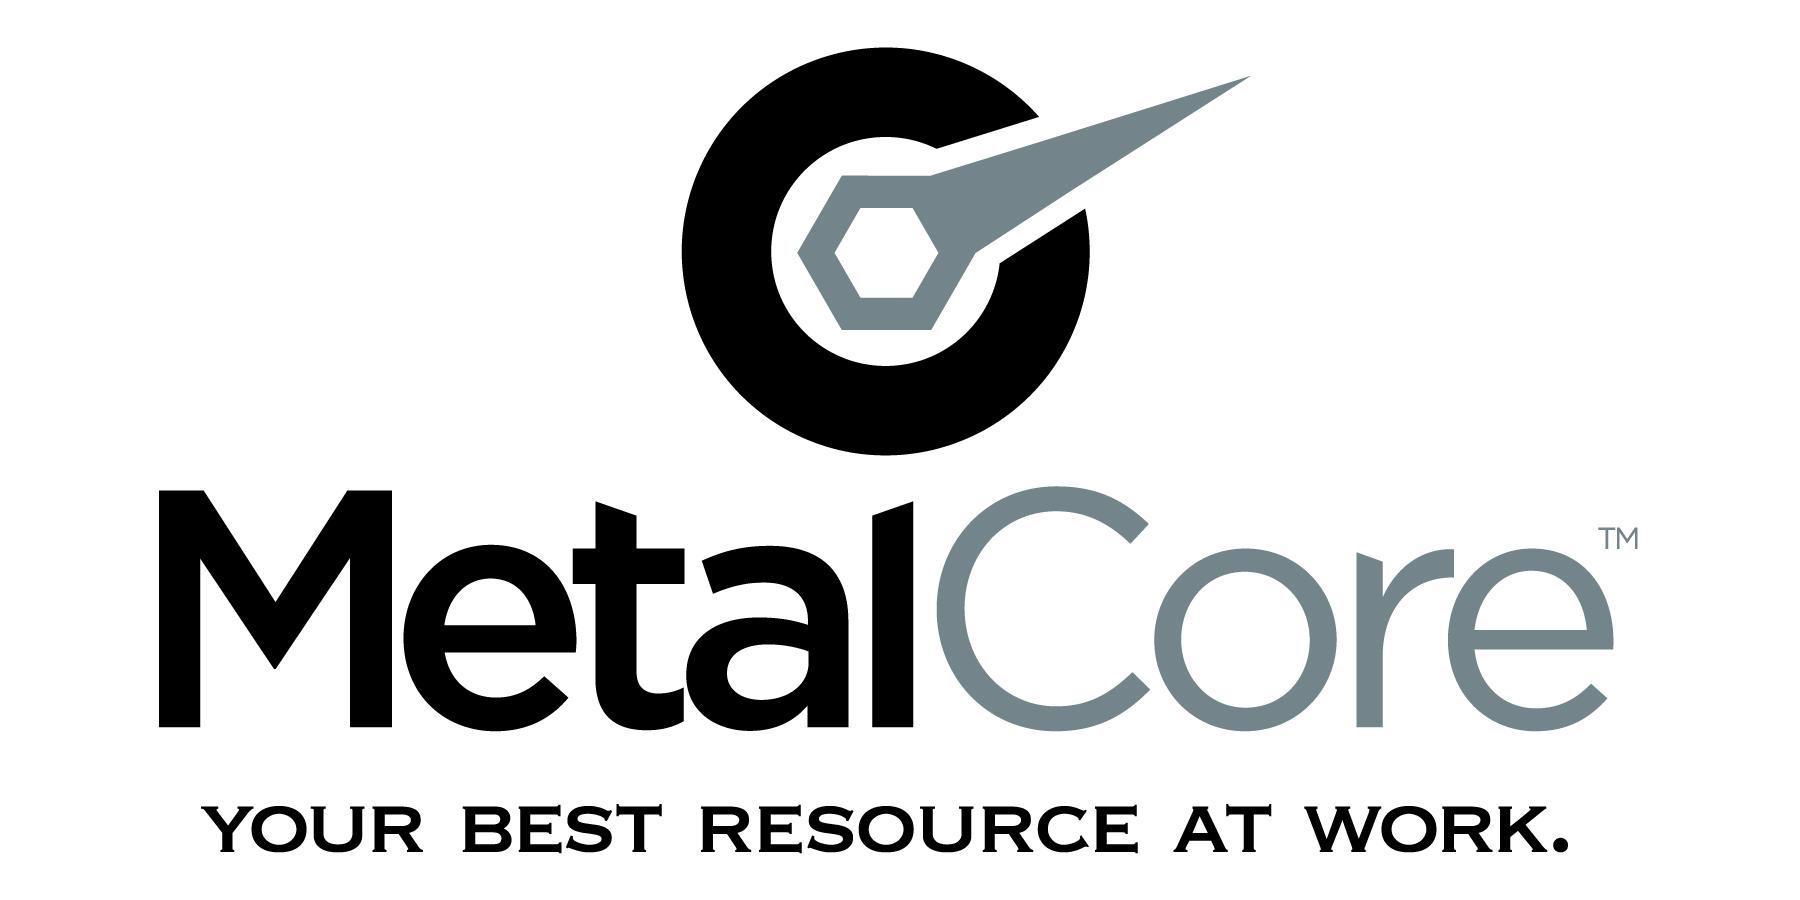 MetalCore To Sponsor Maritime Super Series Tims Corner Motorsports